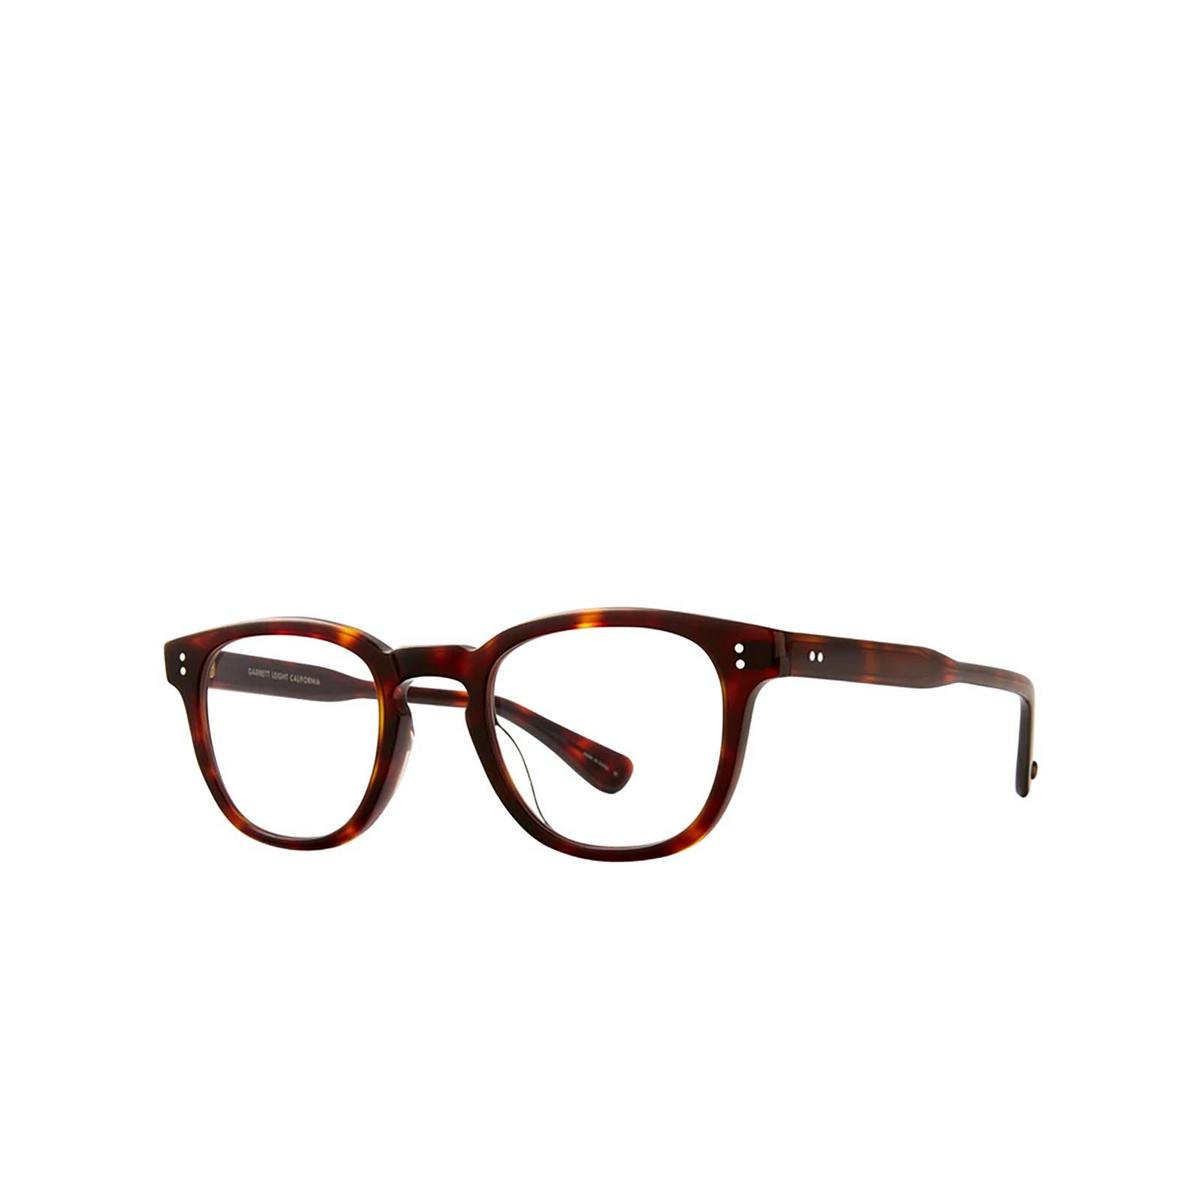 Garrett Leight® Square Eyeglasses: Douglas color 1965 Tortoise 1965TO - three-quarters view.